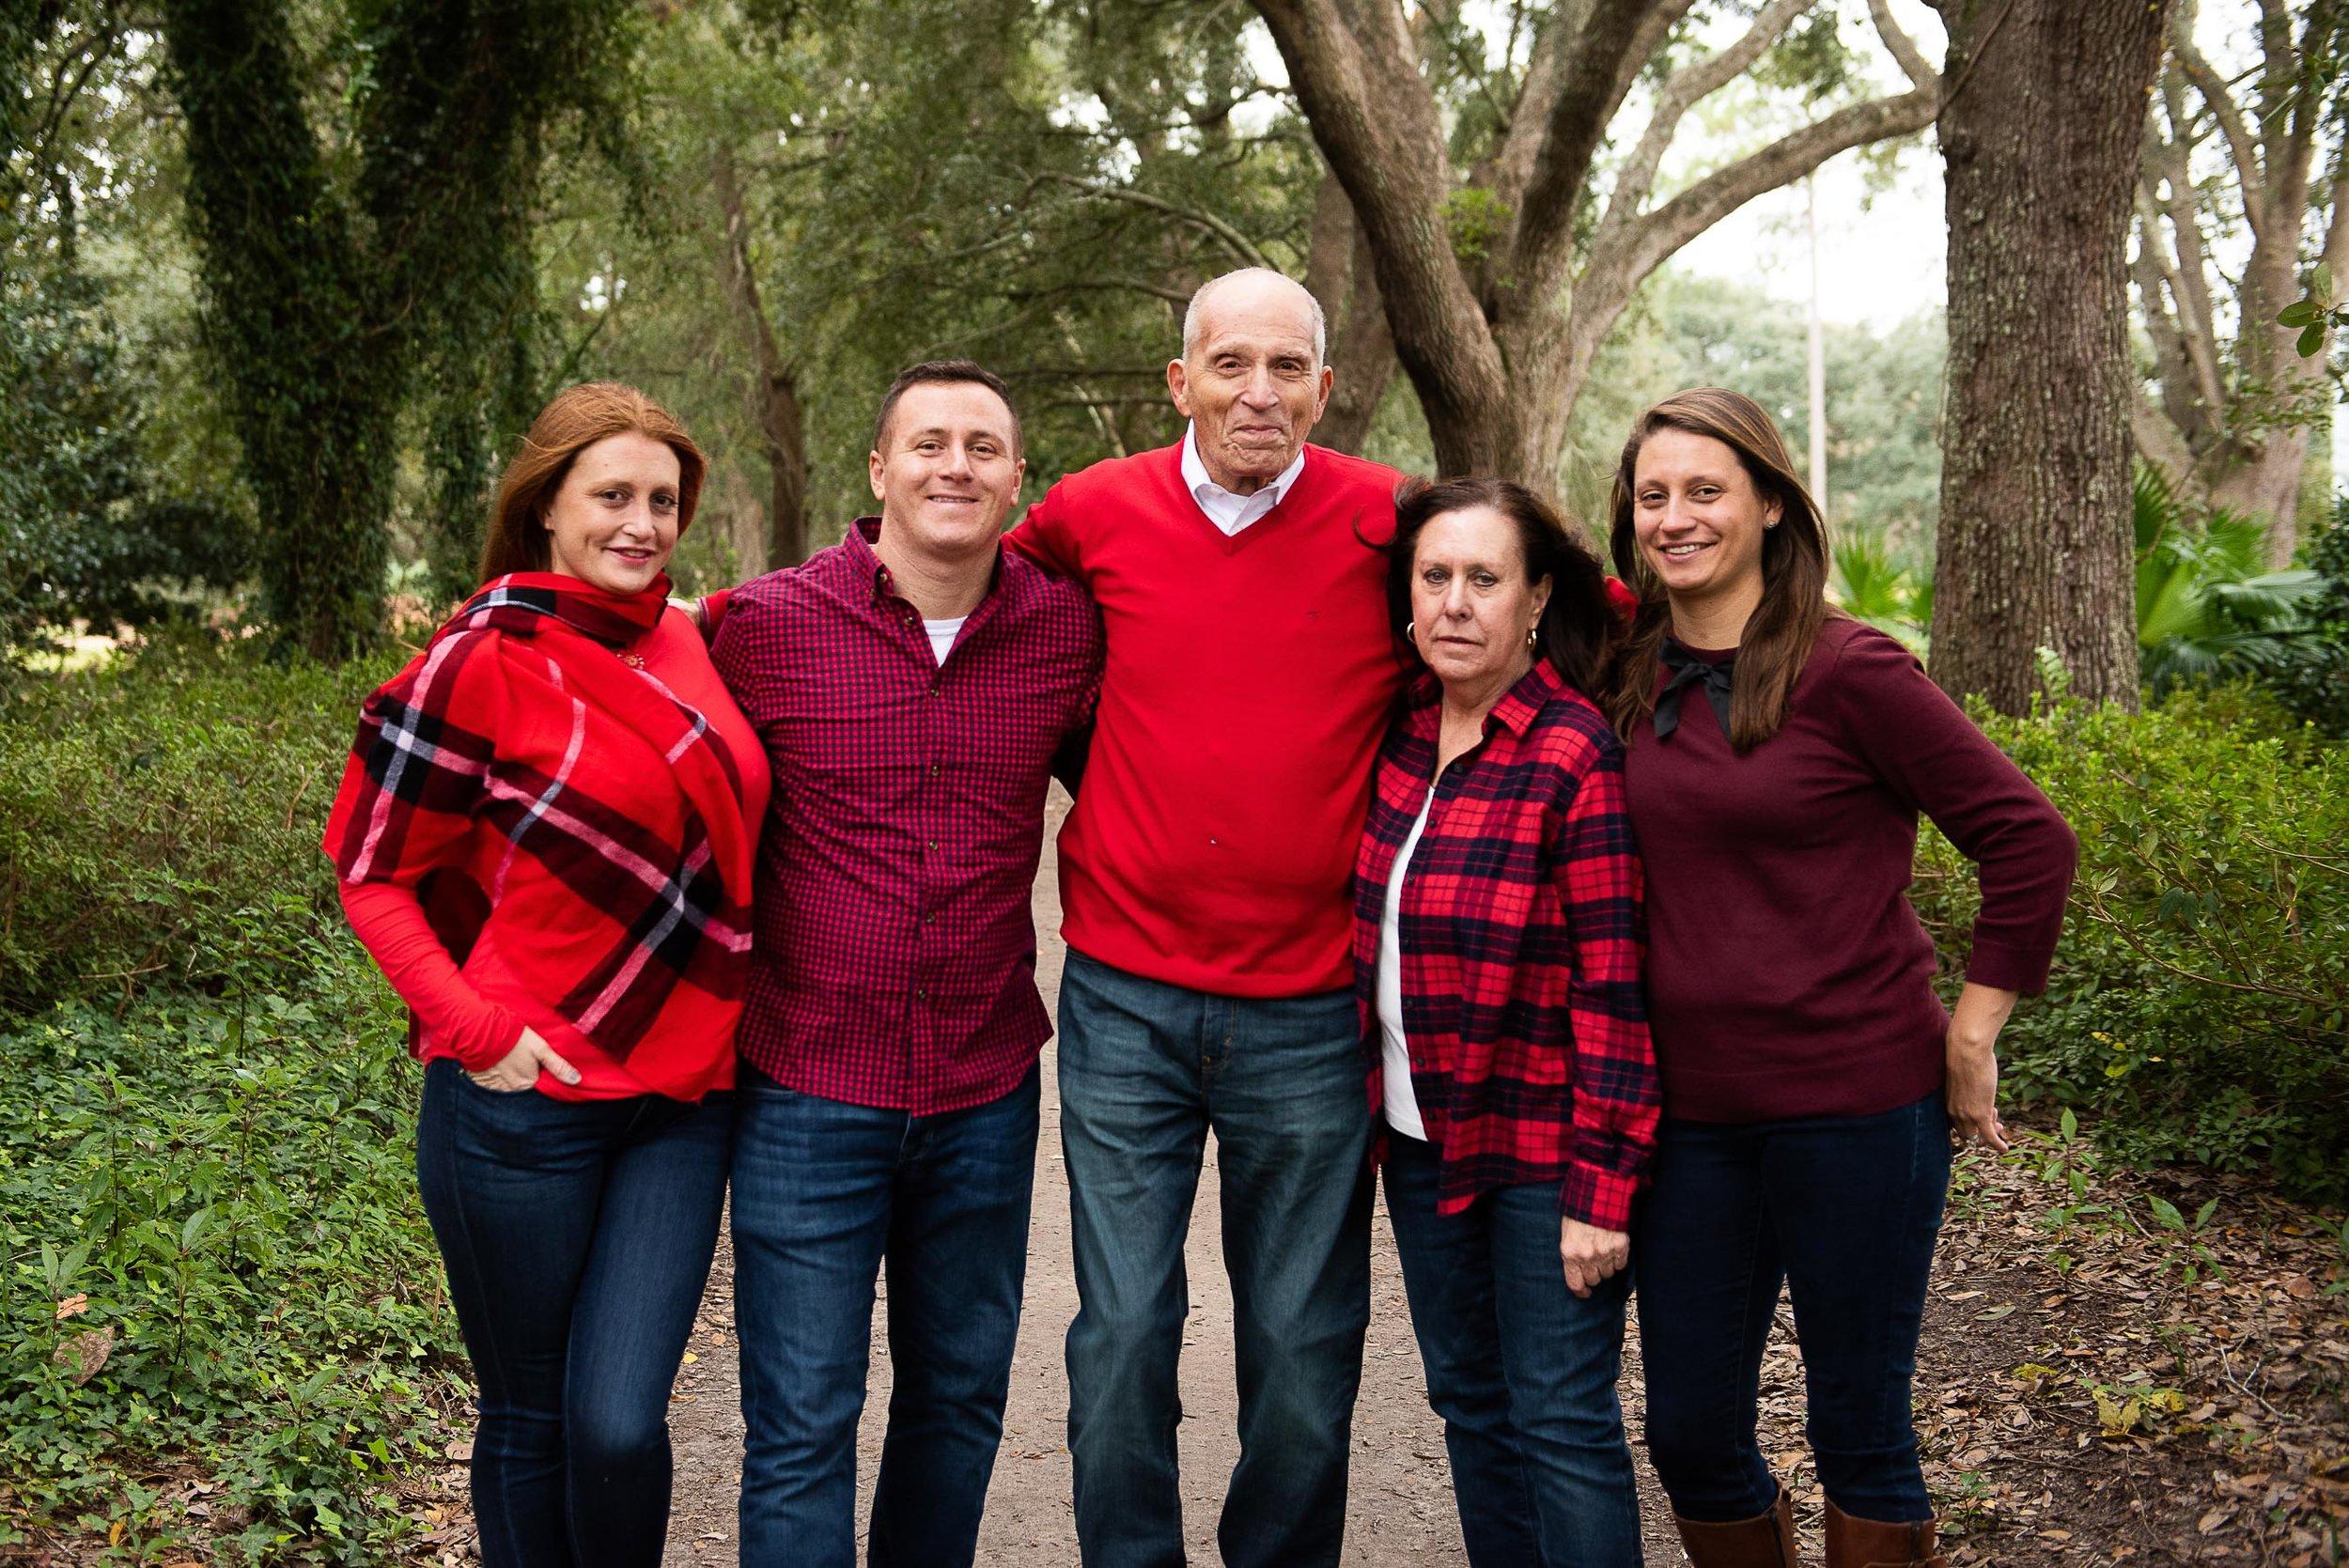 Charleston family portrait